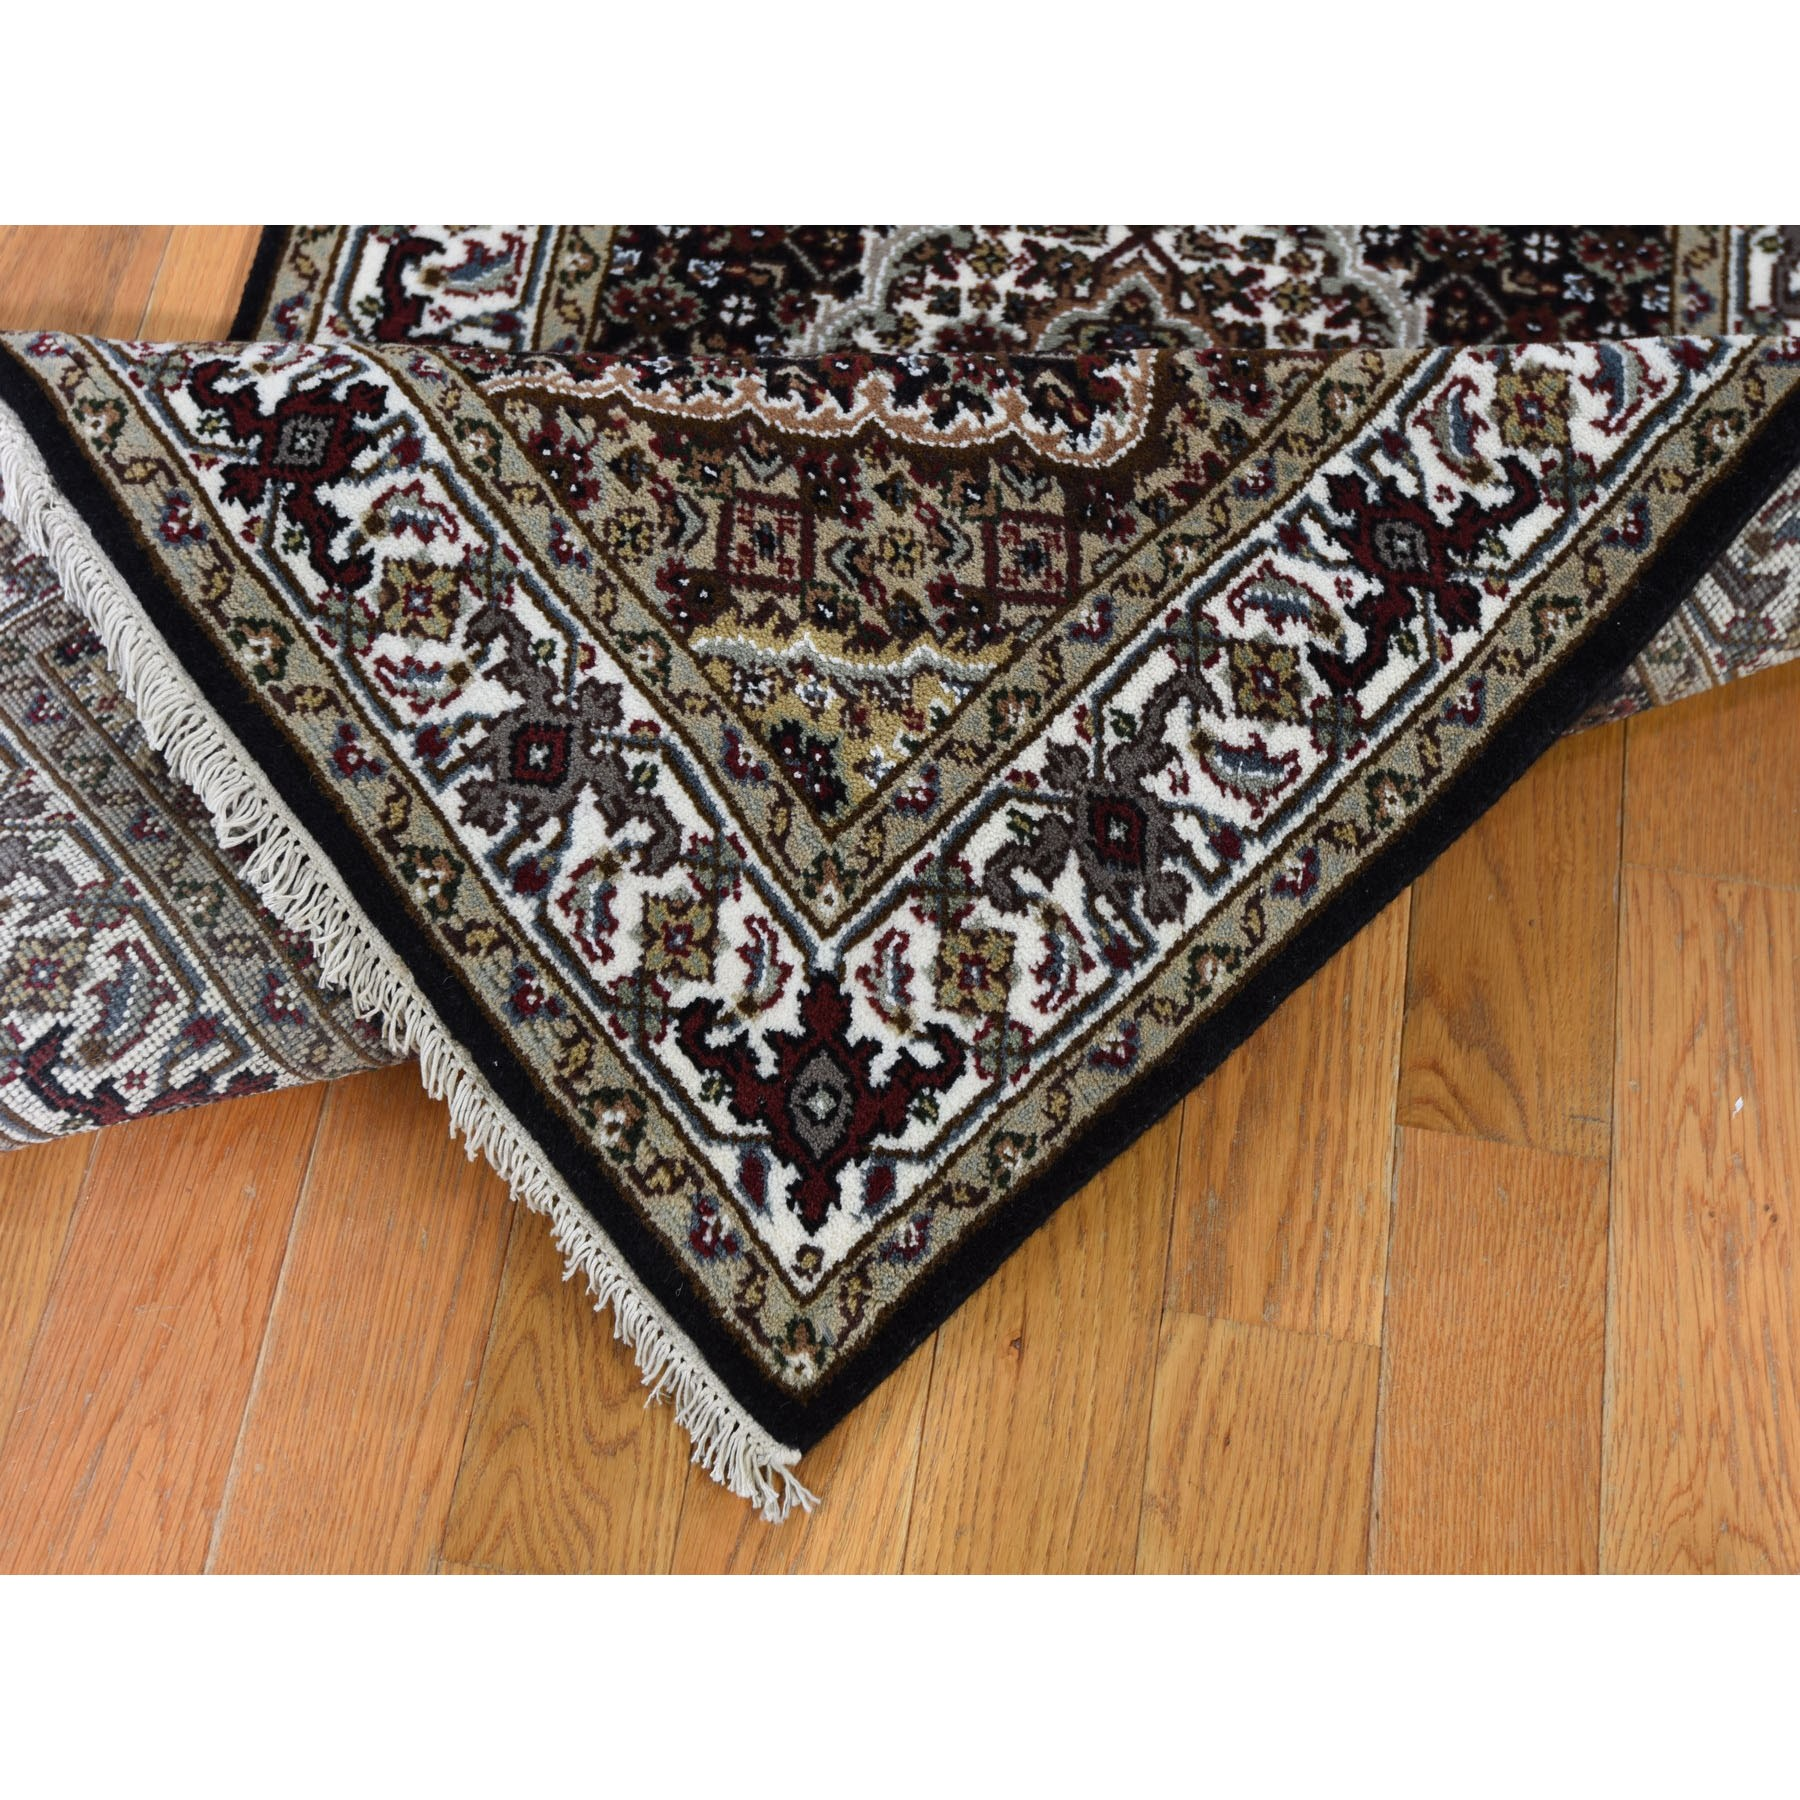 "2'7""x16' Black Tabriz Mahi Wool and Silk XL Runner Hand Knotted Oriental Rug"